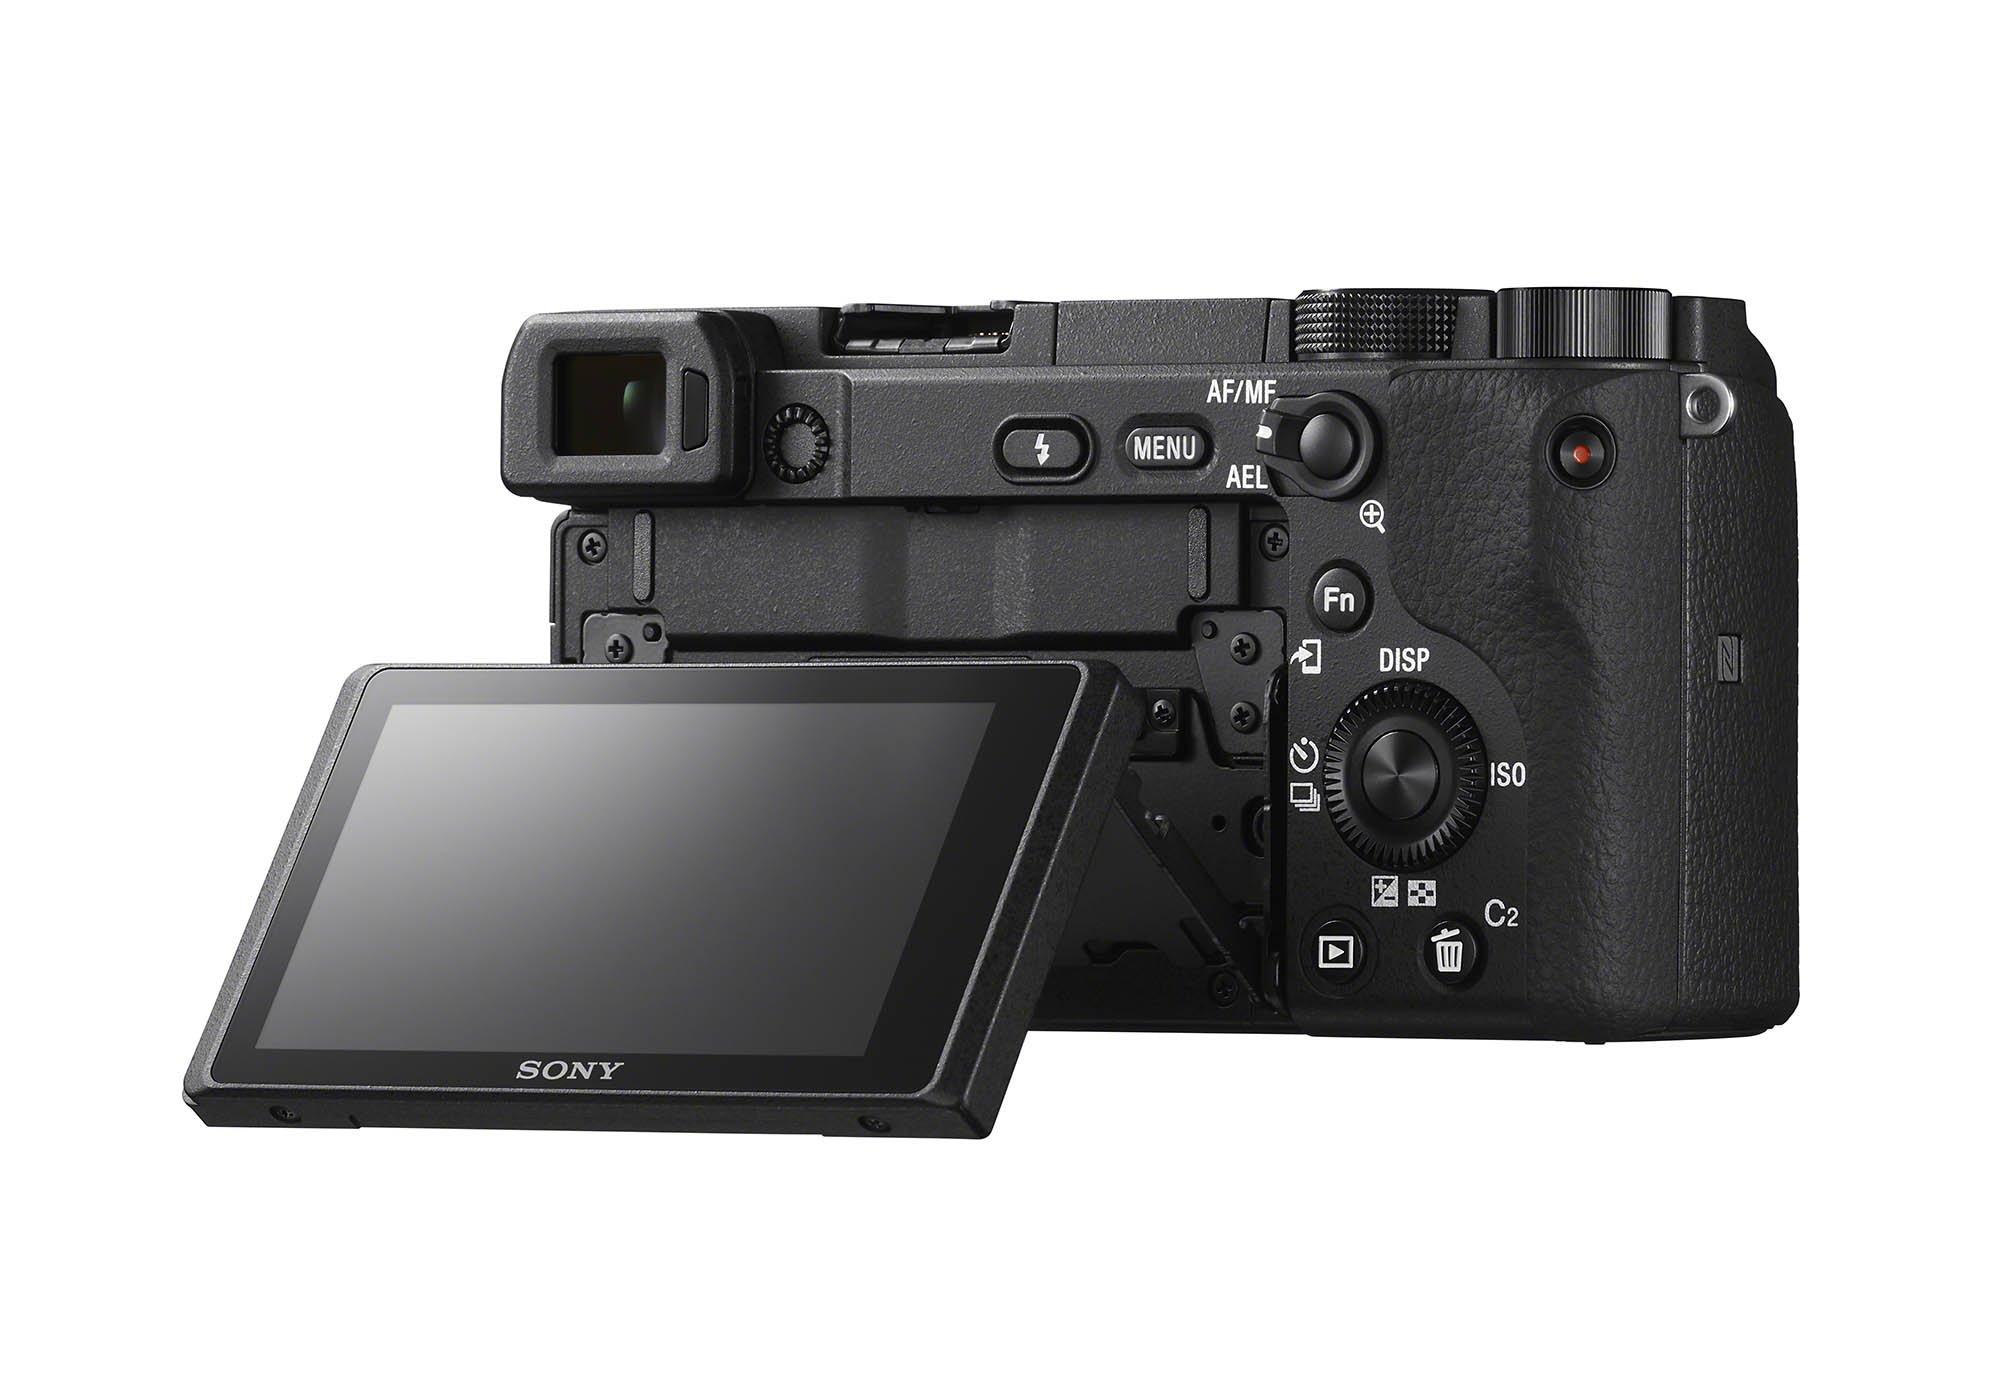 Sony a6400 Rear LCD Tilt